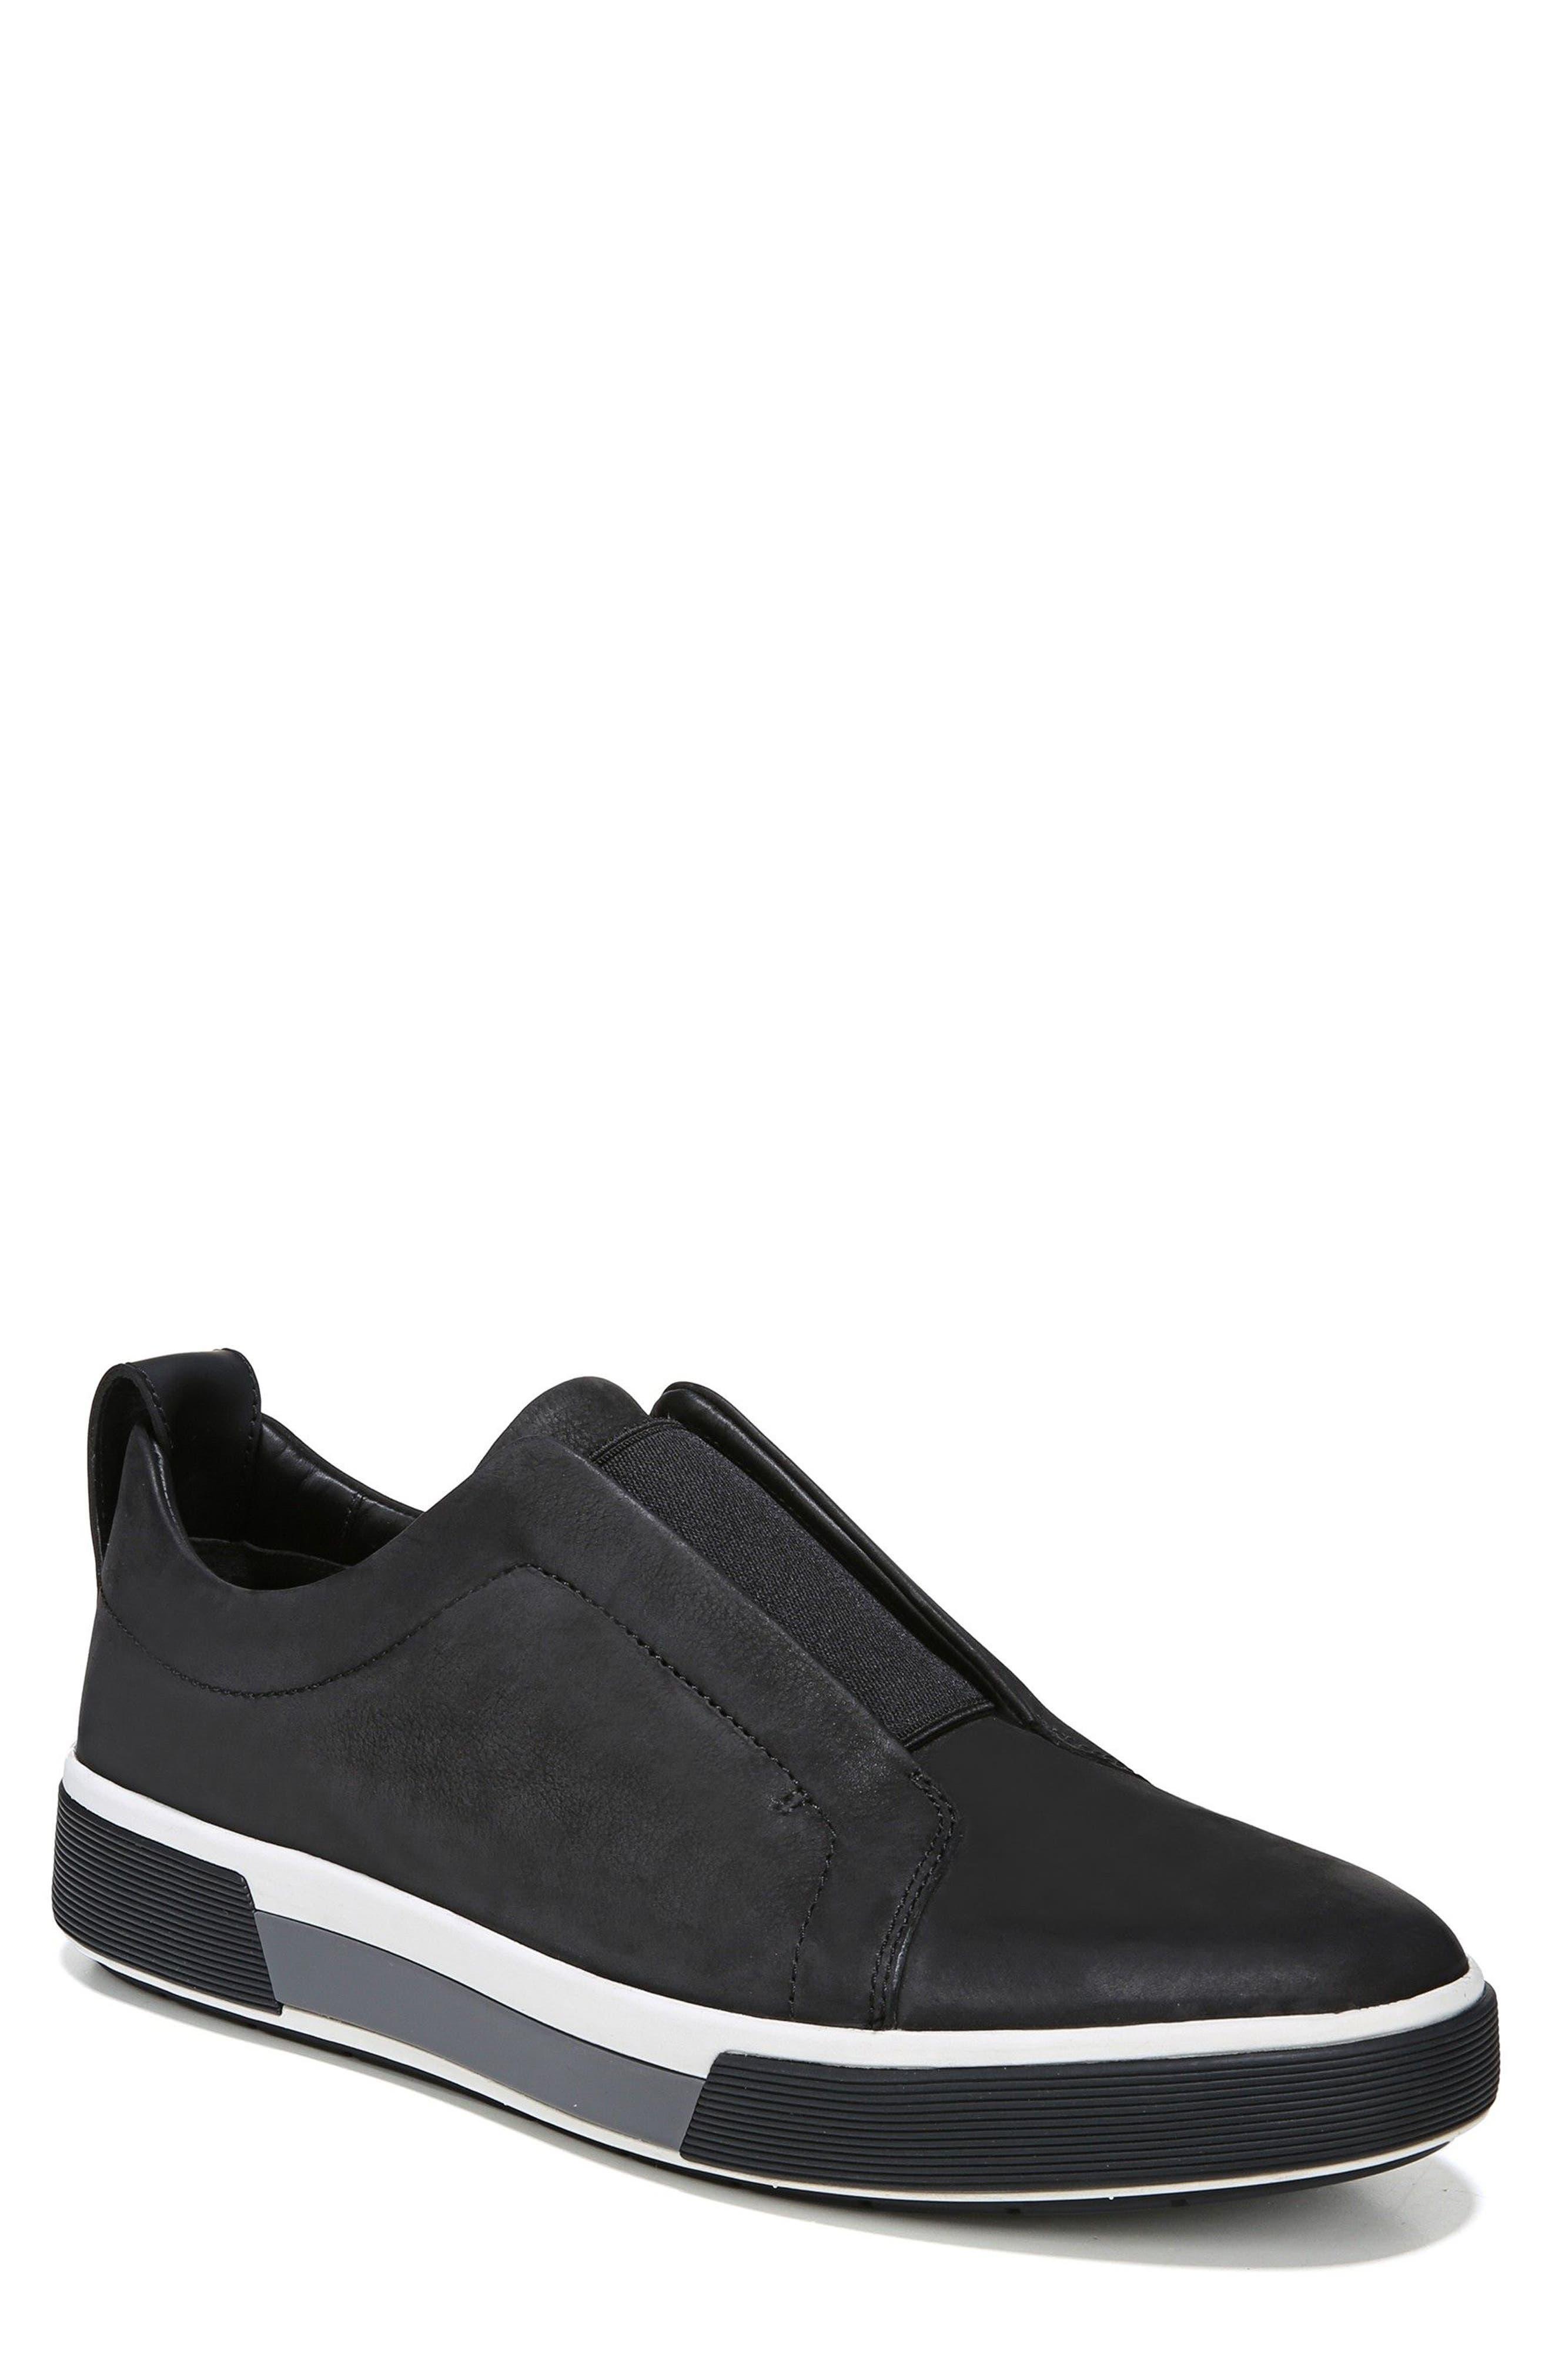 VINCE, Ranger Laceless Sneaker, Main thumbnail 1, color, BLACK